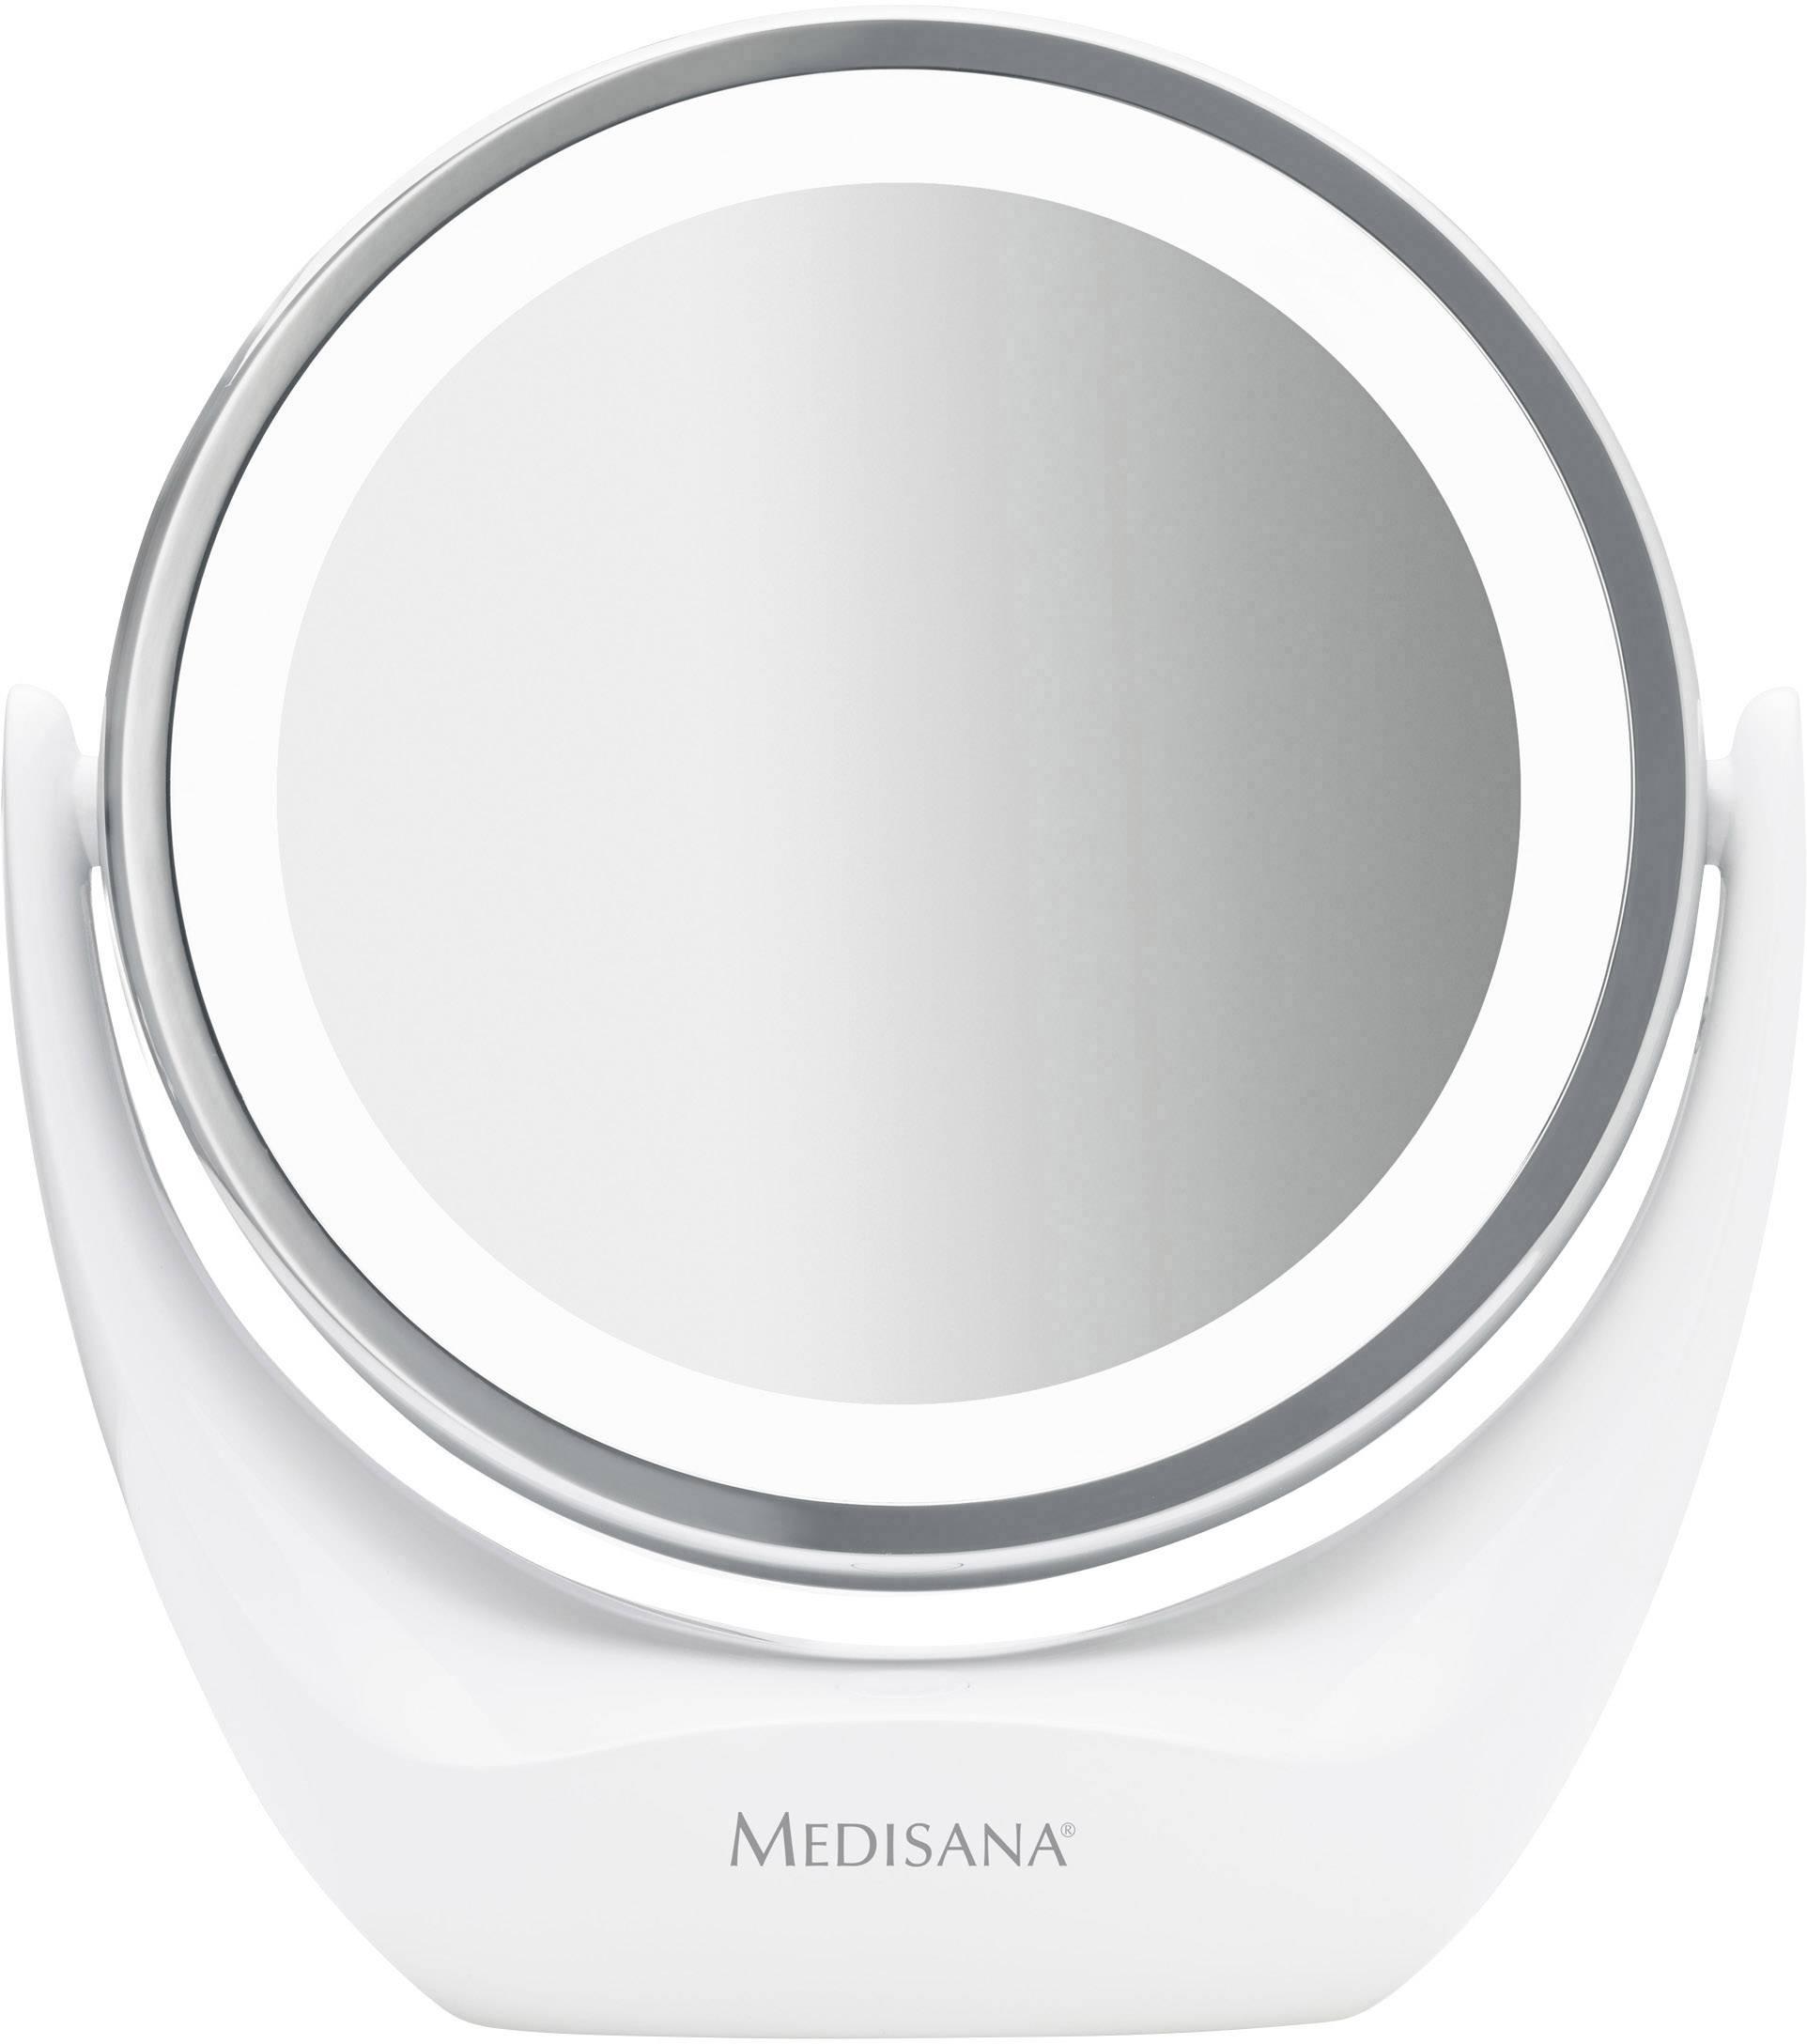 Vergrotende Spiegel Badkamer : ▷ vergrotende spiegel kopen online internetwinkel